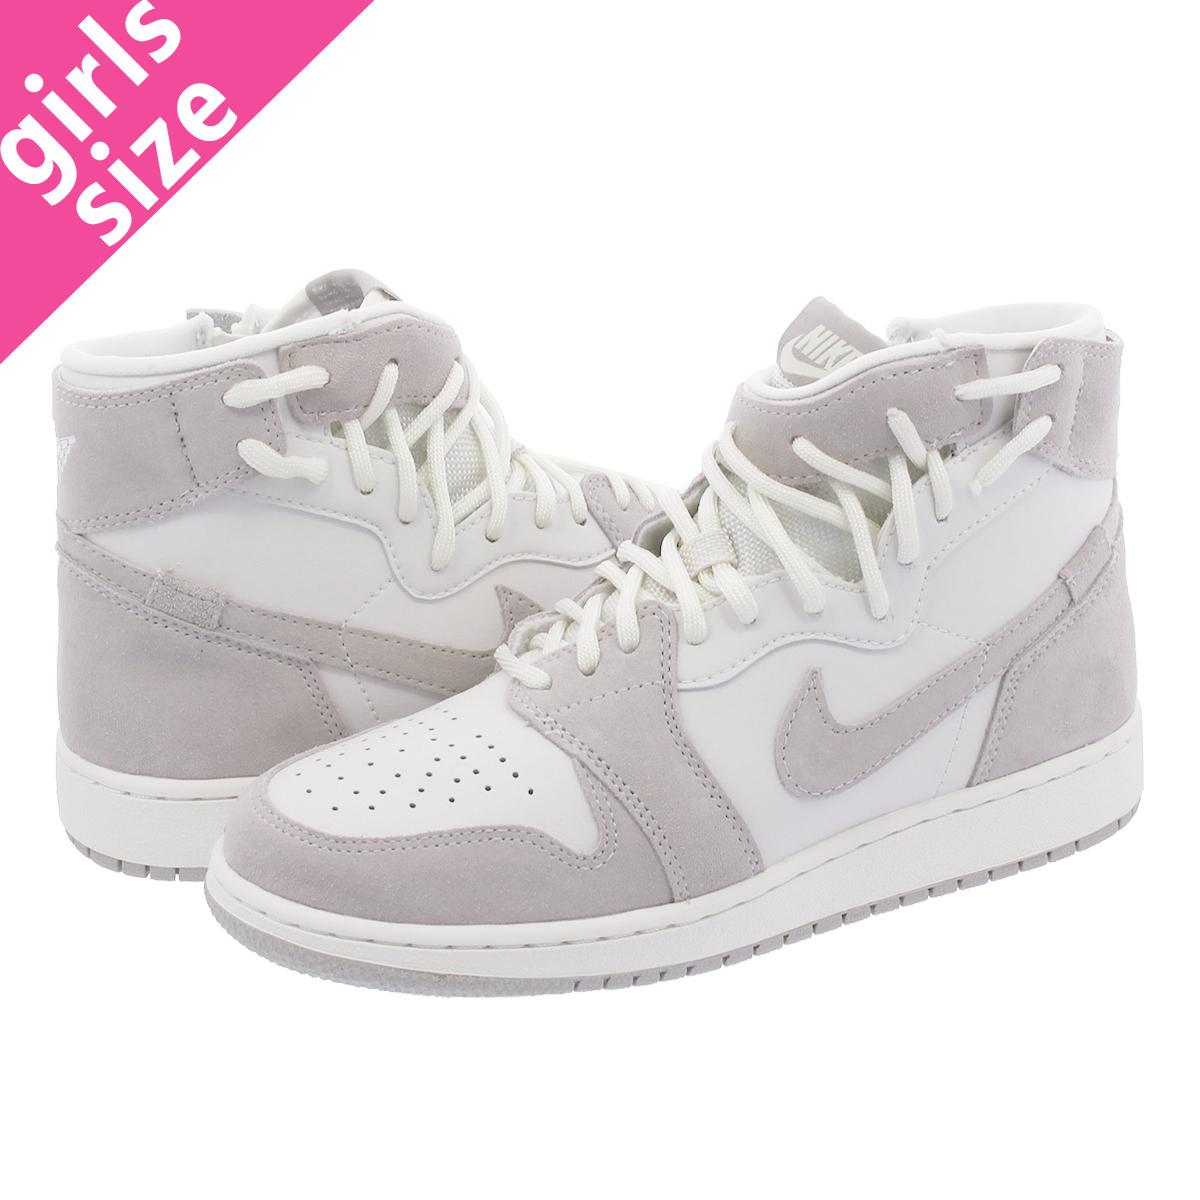 a8ce96071cbc40 NIKE WMNS AIR JORDAN 1 REBEL XX Nike women Air Jordan 1 level XX REBEL XX  MOON PARTICLE MOON PARTICLE PHANTOM ar5599-200